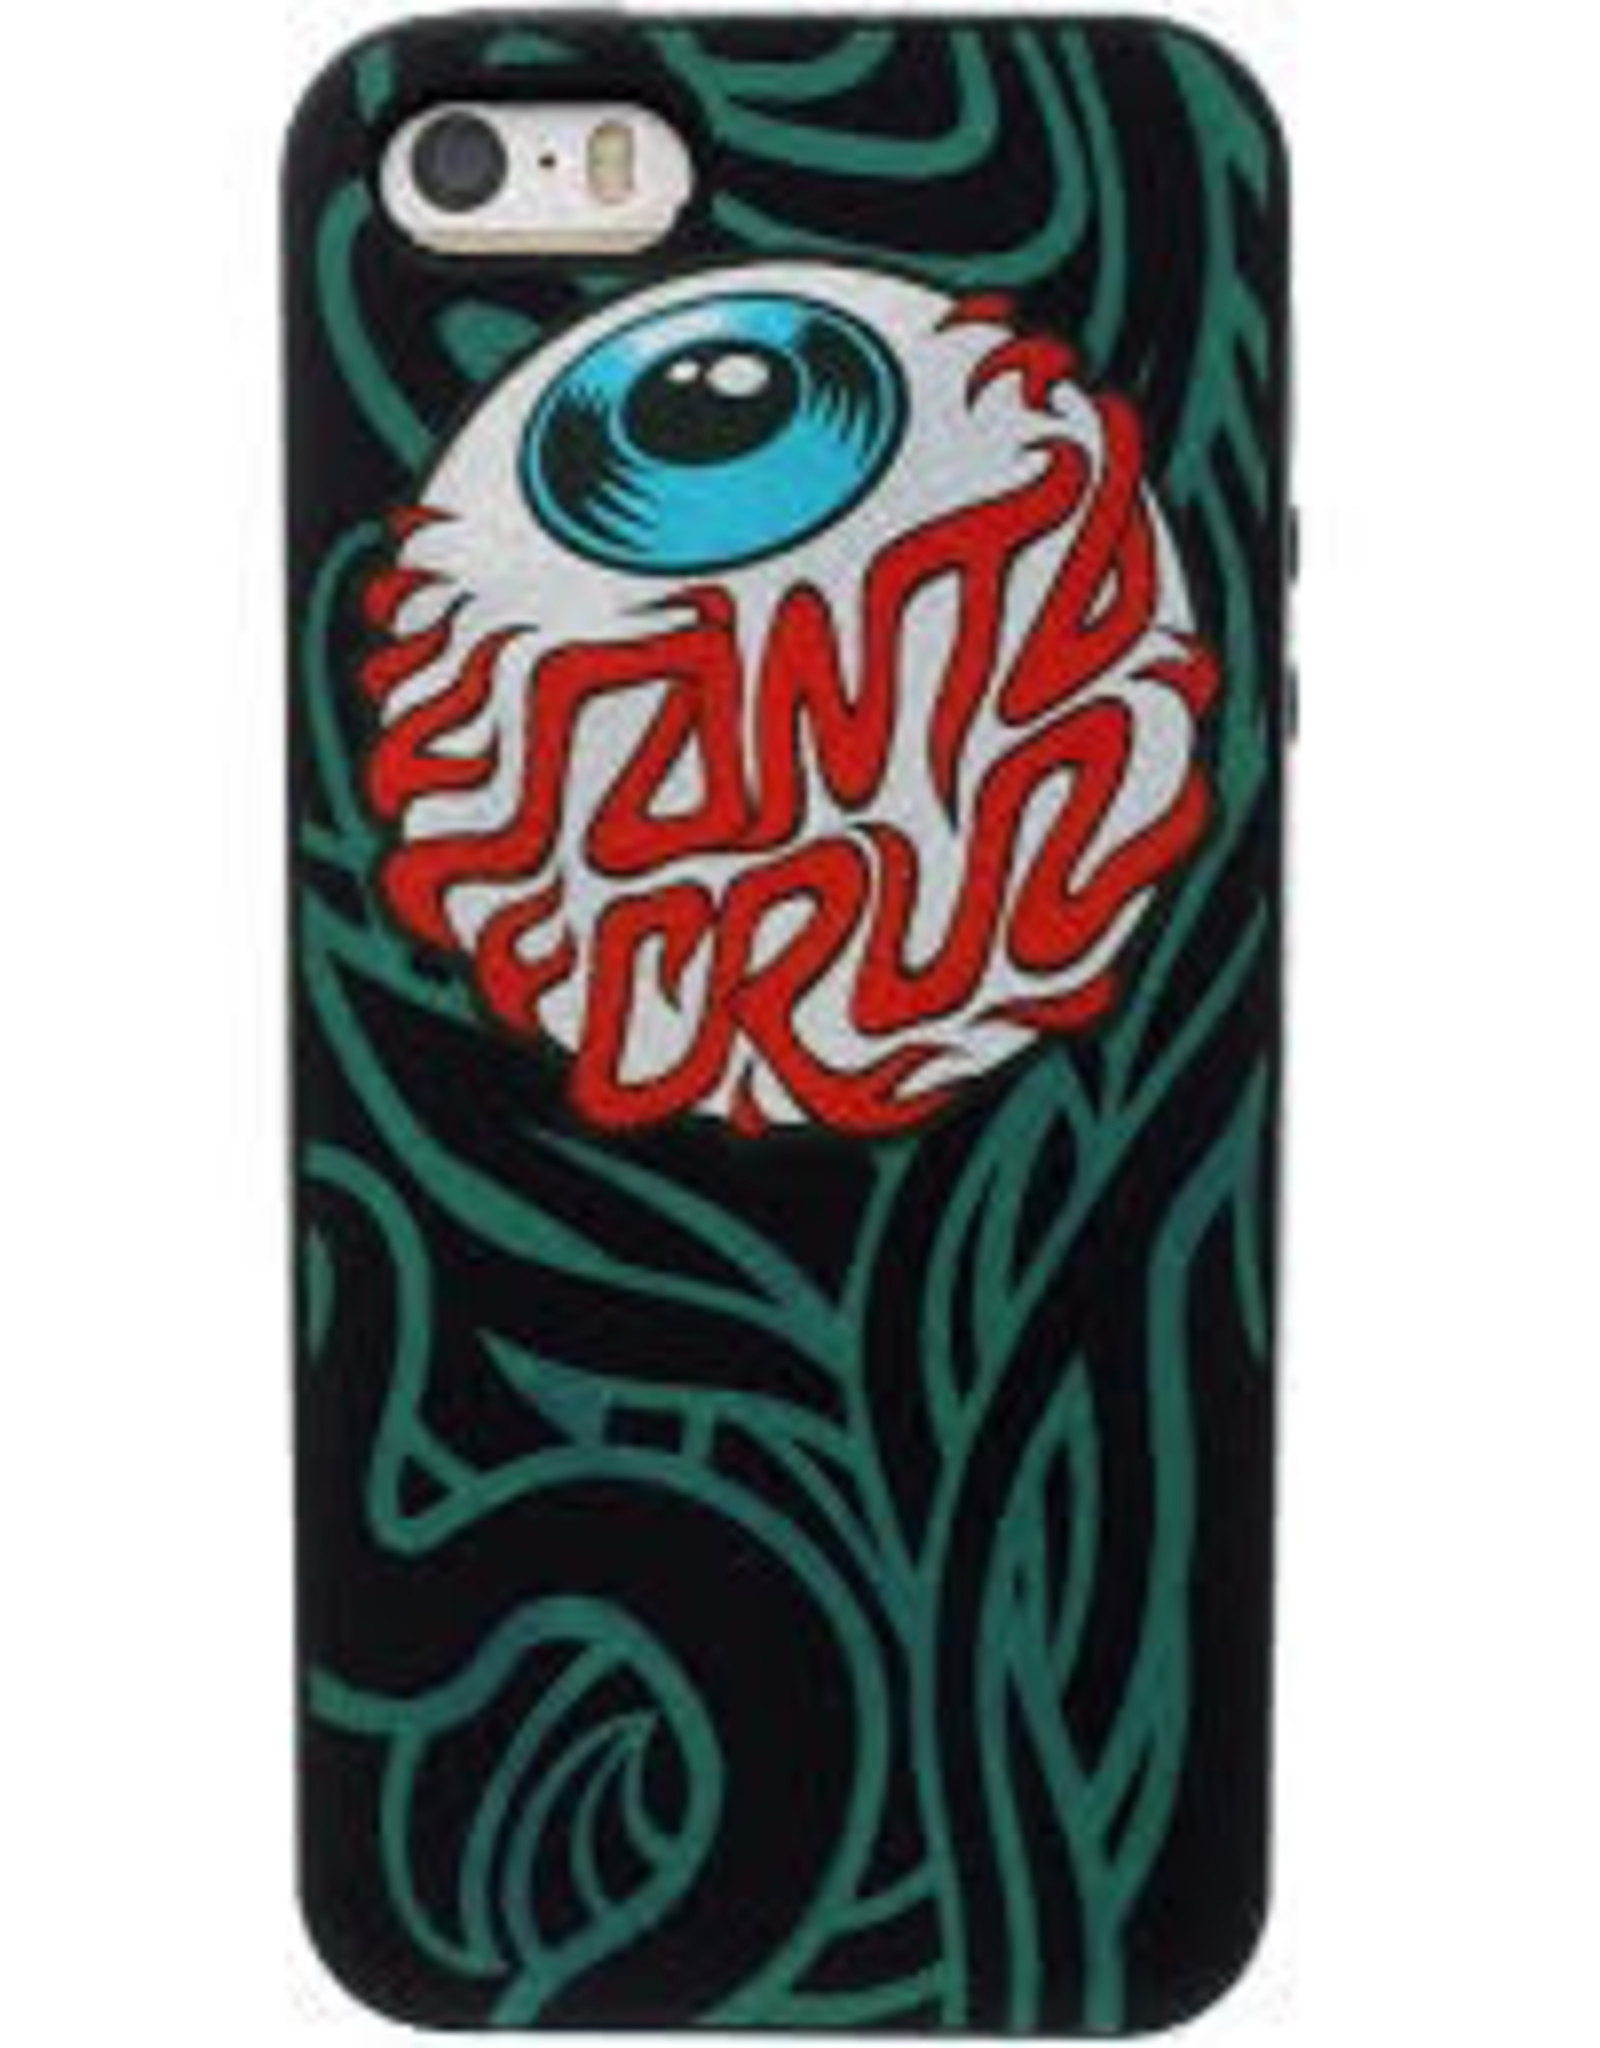 Santa Cruz Santa Cruz Iphone 5 cover Case, Black